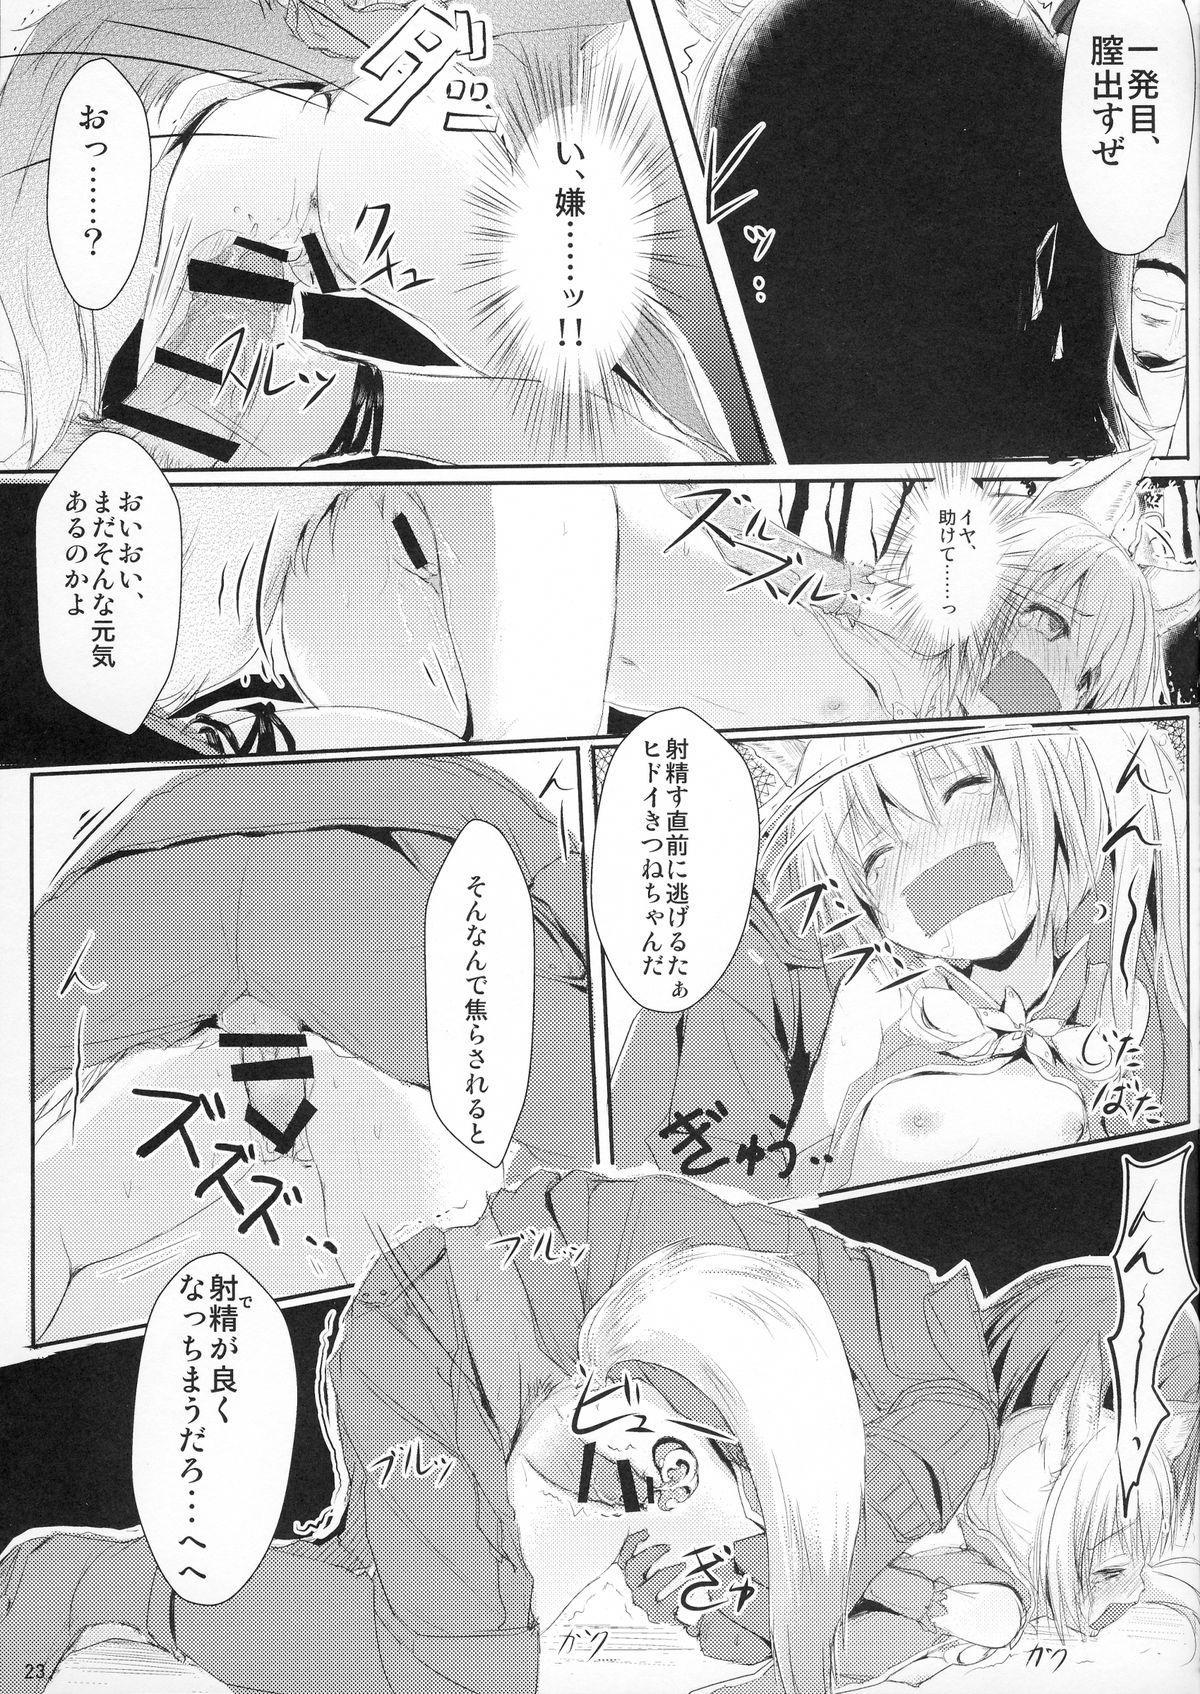 [Mirukomi (PRIMIL)] Human wa Erin-chan ni Hidoi Koto Shitai yo ne - ELIN's the best - (TERA The Exiled Realm of Arborea) 22